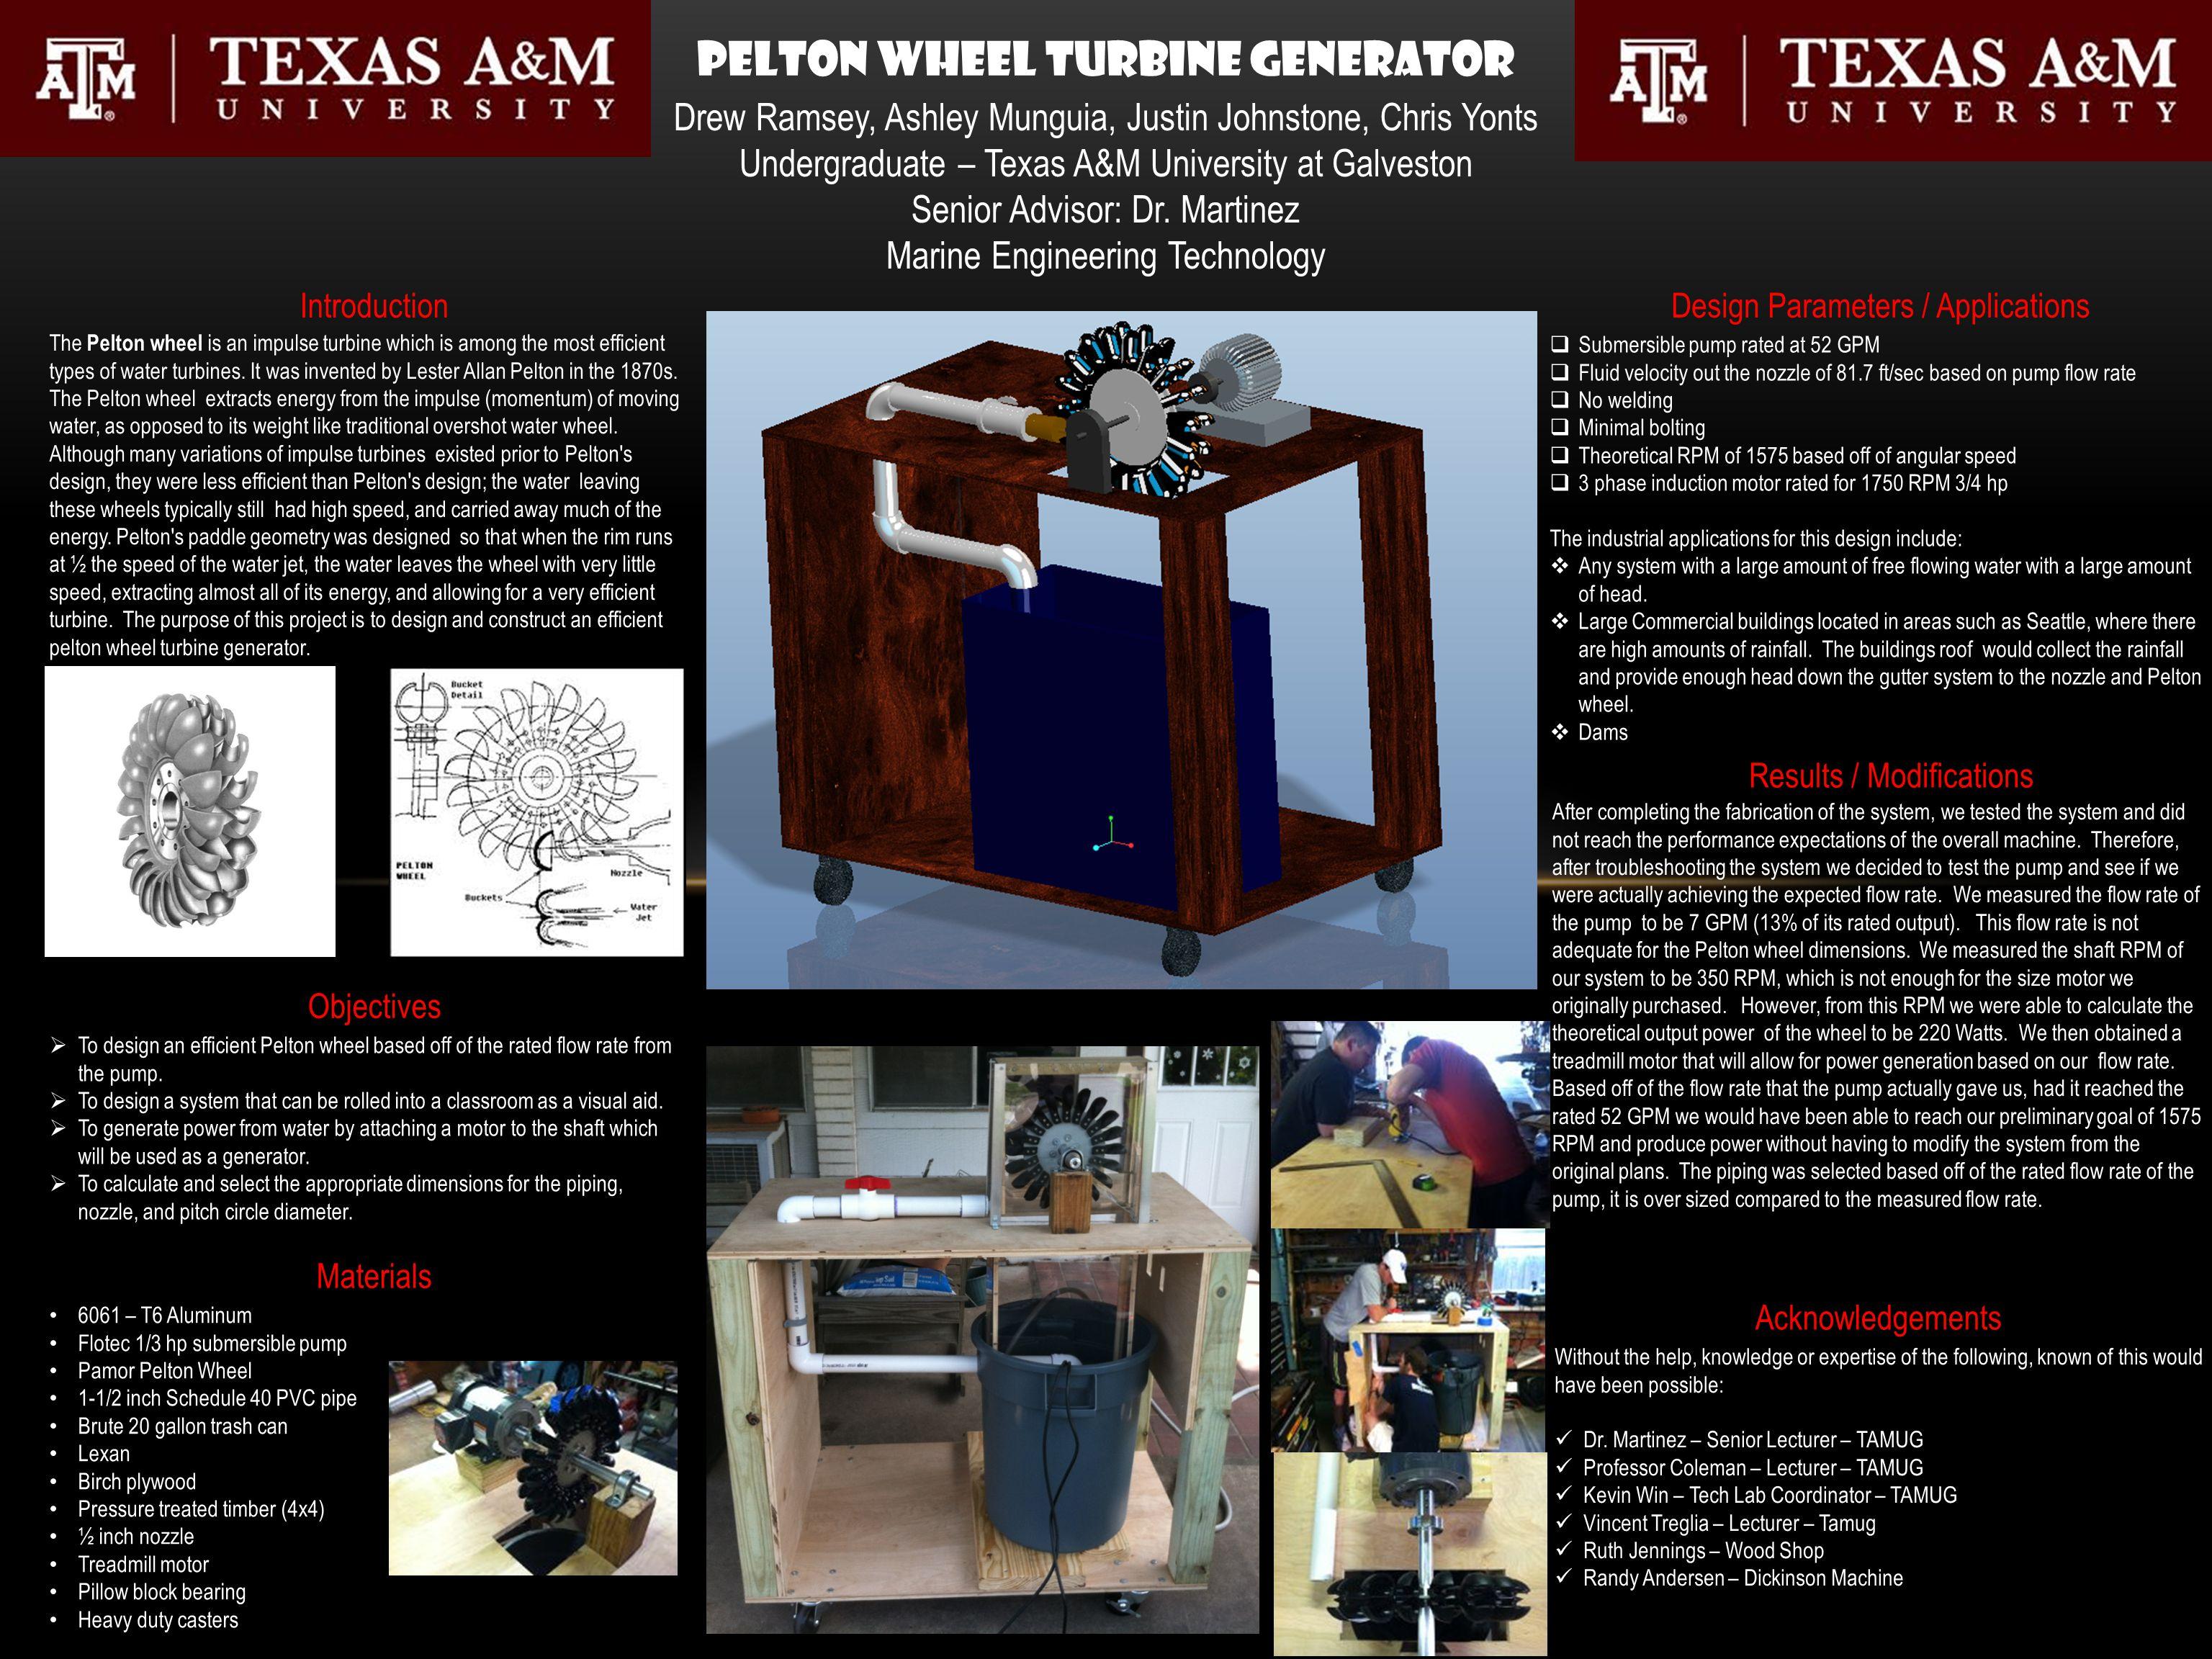 Pelton Wheel Turbine Generator Drew Ramsey, Ashley Munguia, Justin Johnstone, Chris Yonts Undergraduate – Texas A&M University at Galveston Senior Advisor: Dr.